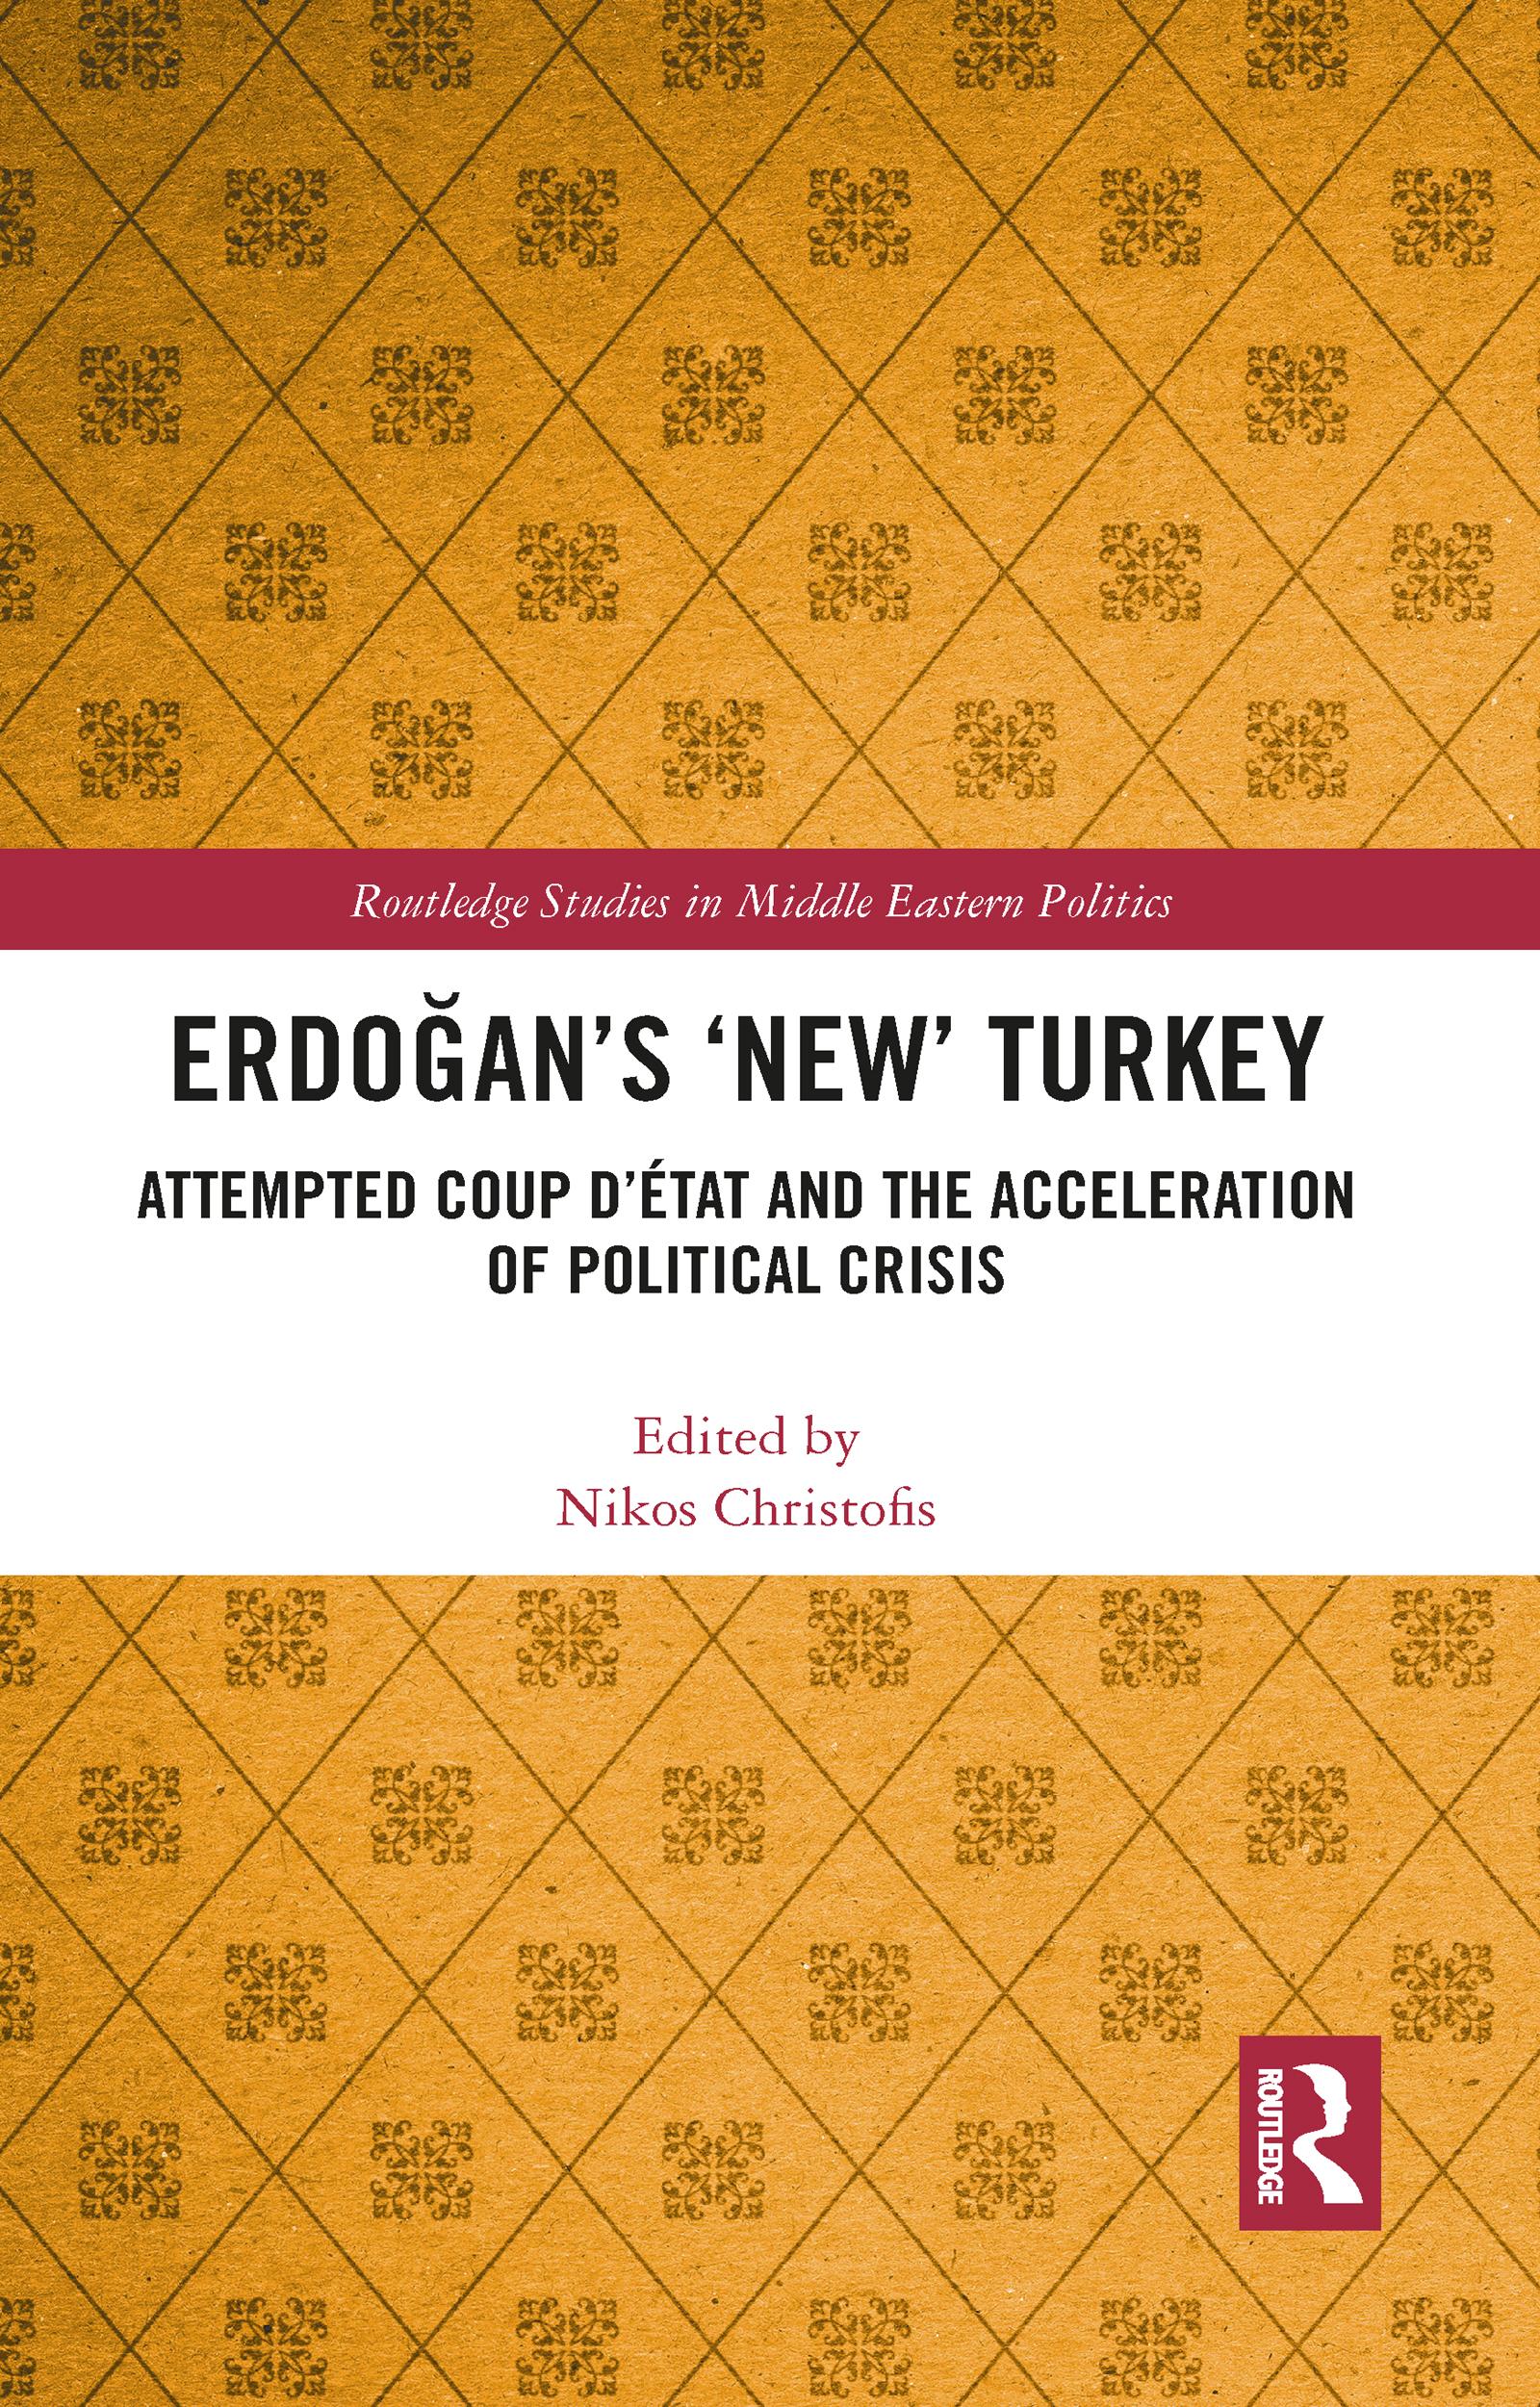 Erdoğan's 'New' Turkey